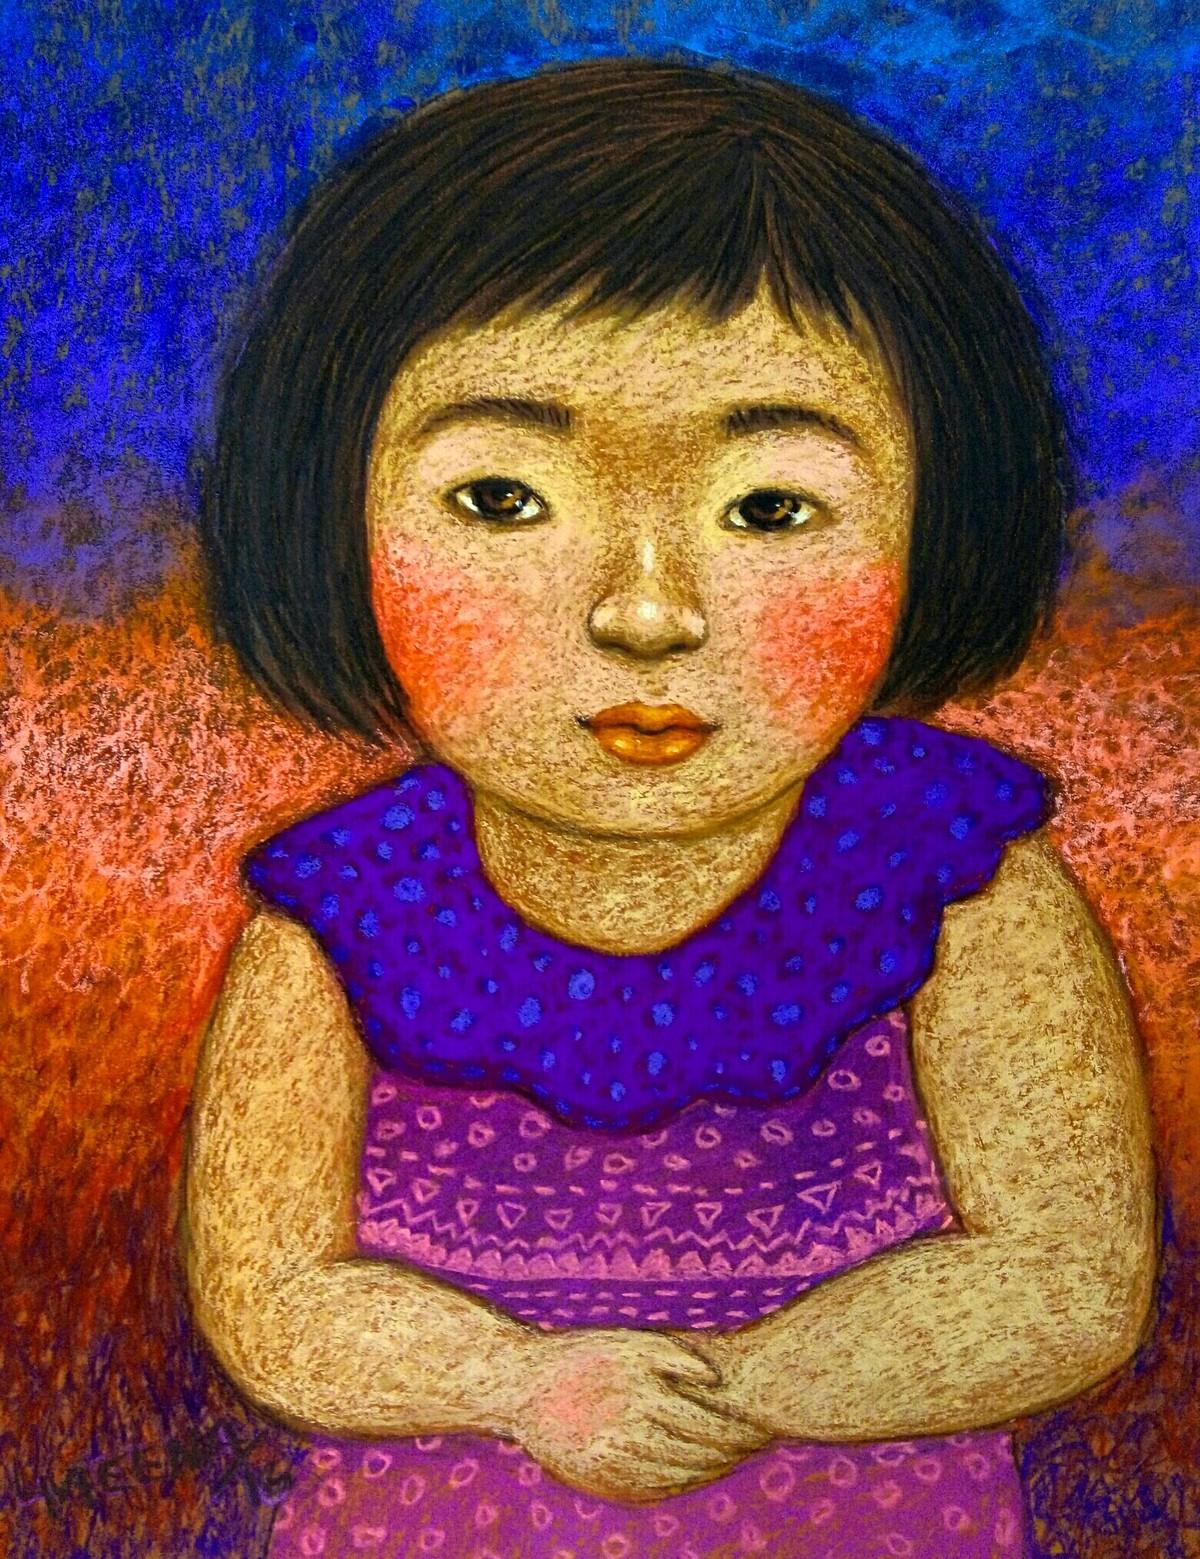 Innocent Look 2 Digital Print by Meena Laishram,Expressionism